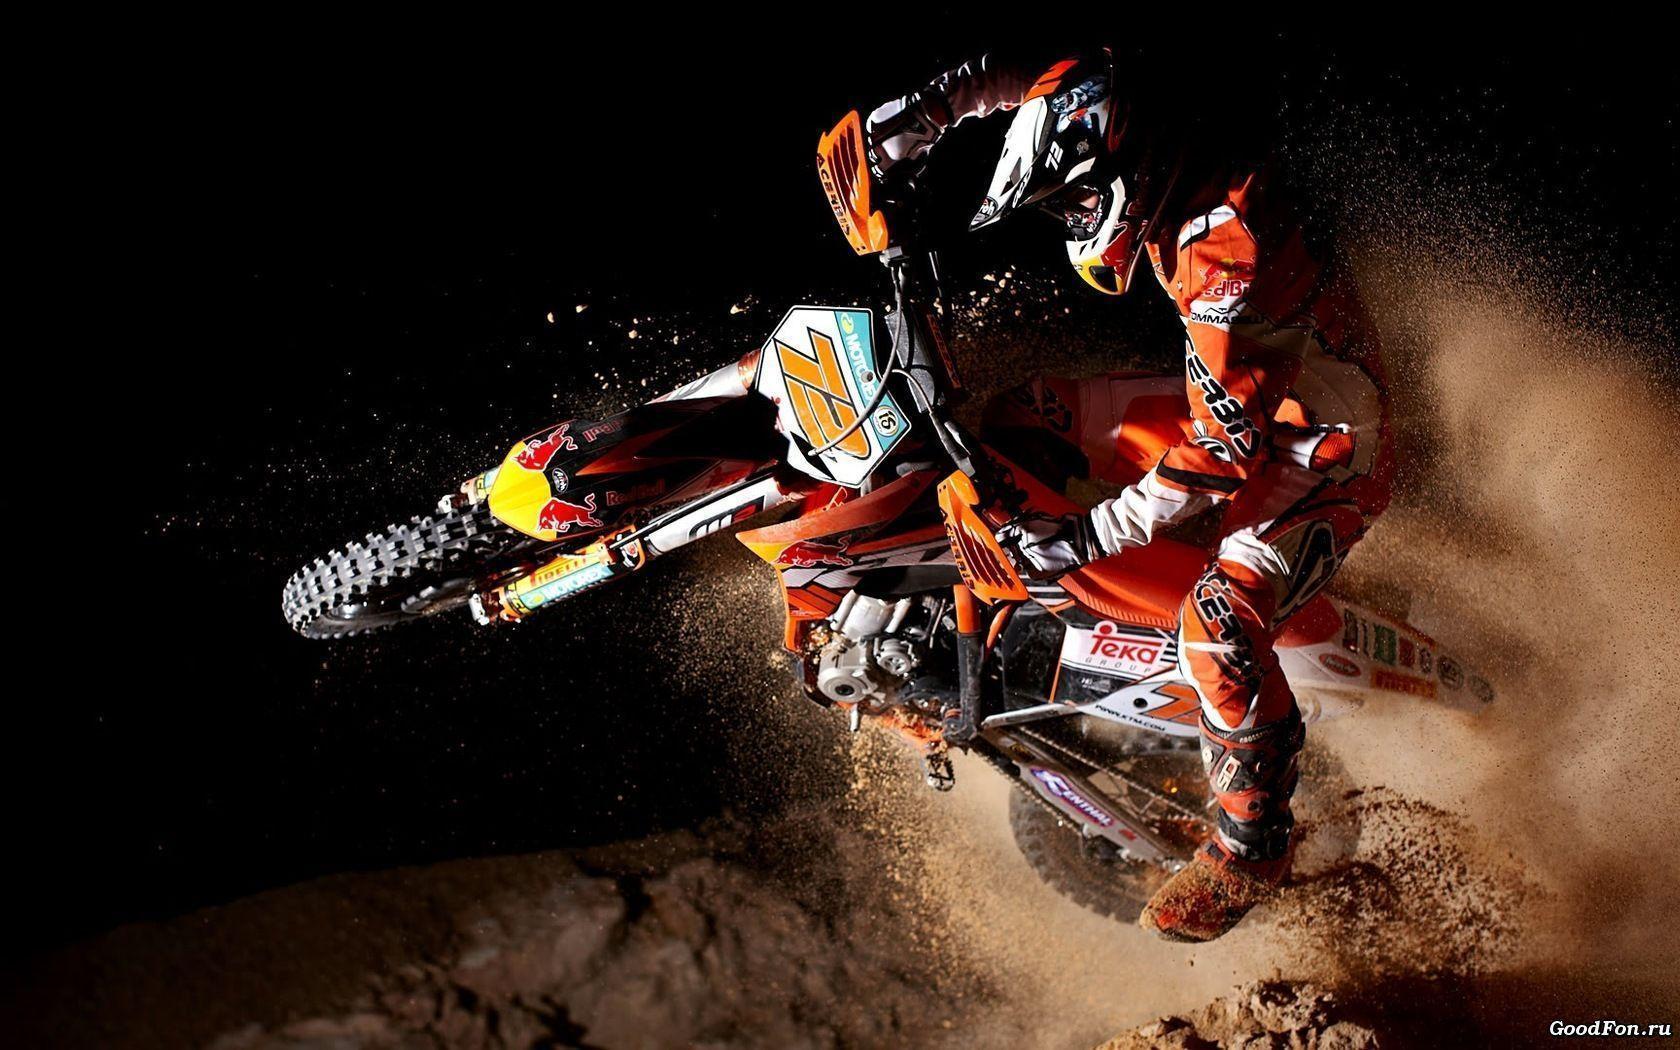 Wallpapers Motocross KTM - Wallpaper Cave